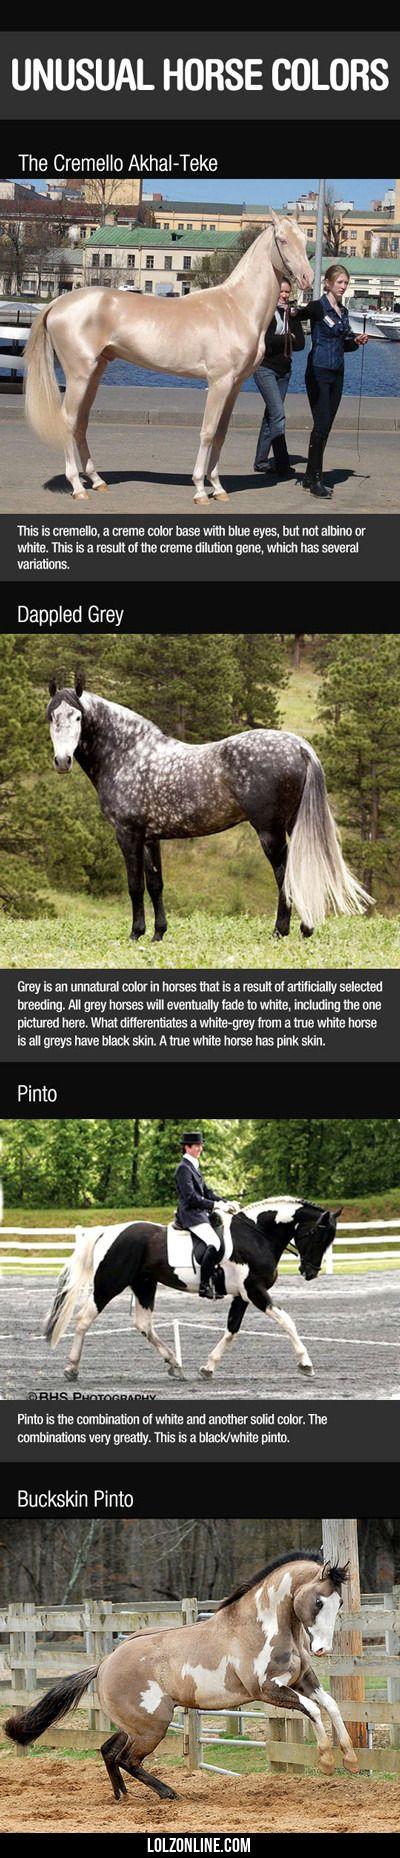 Unusual Horse Colors...